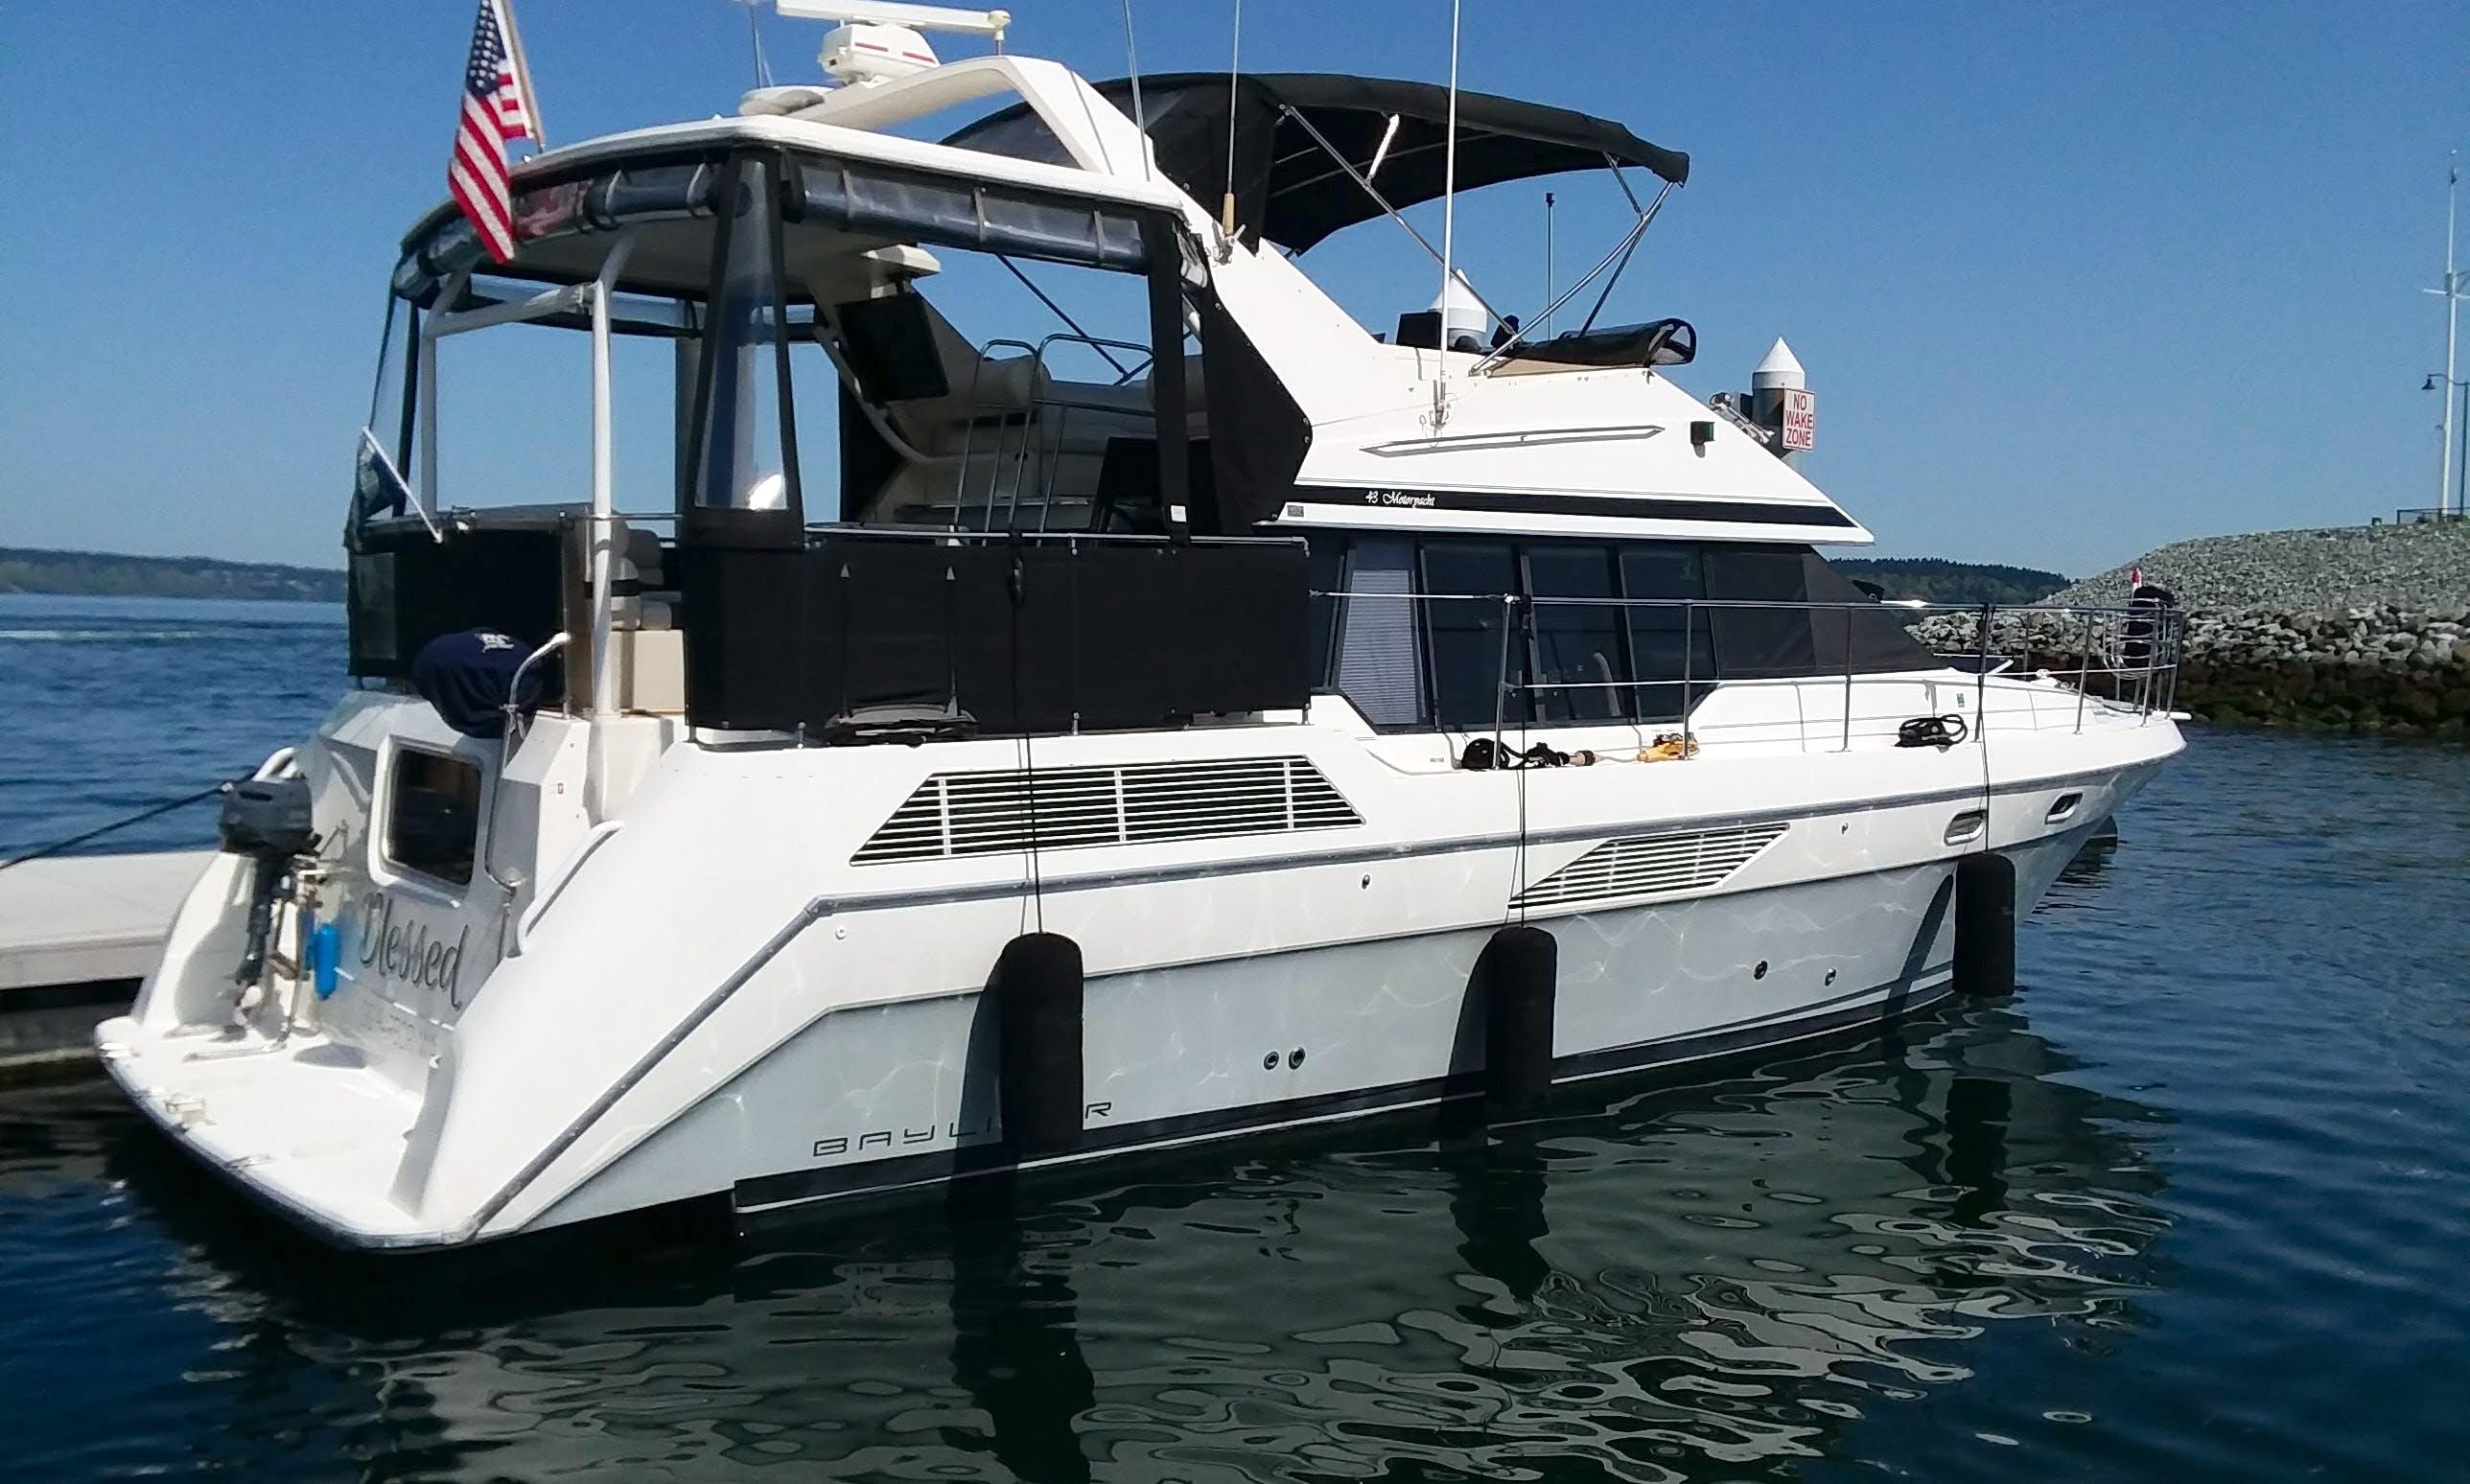 Motor Yacht Charter in Puget Sound or Lake Washington